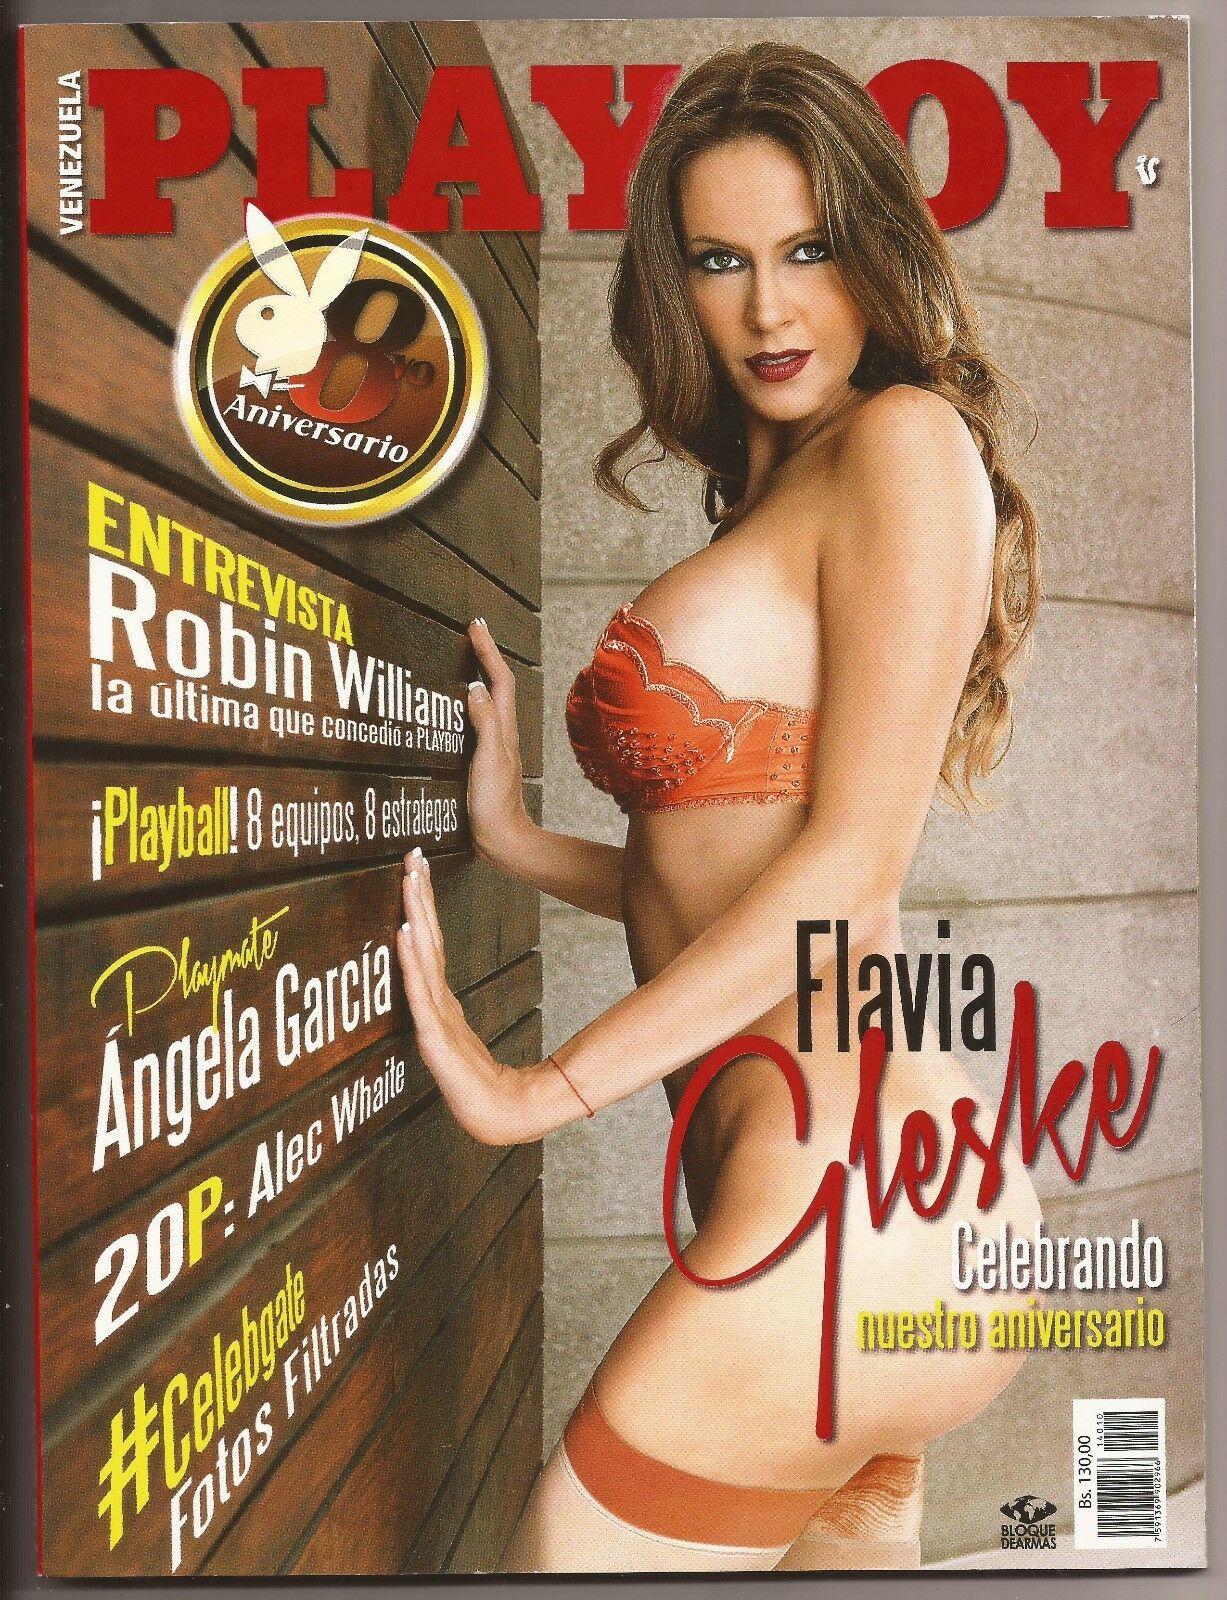 Flavia Playboy playboy venezuela october 2014 cover flavia